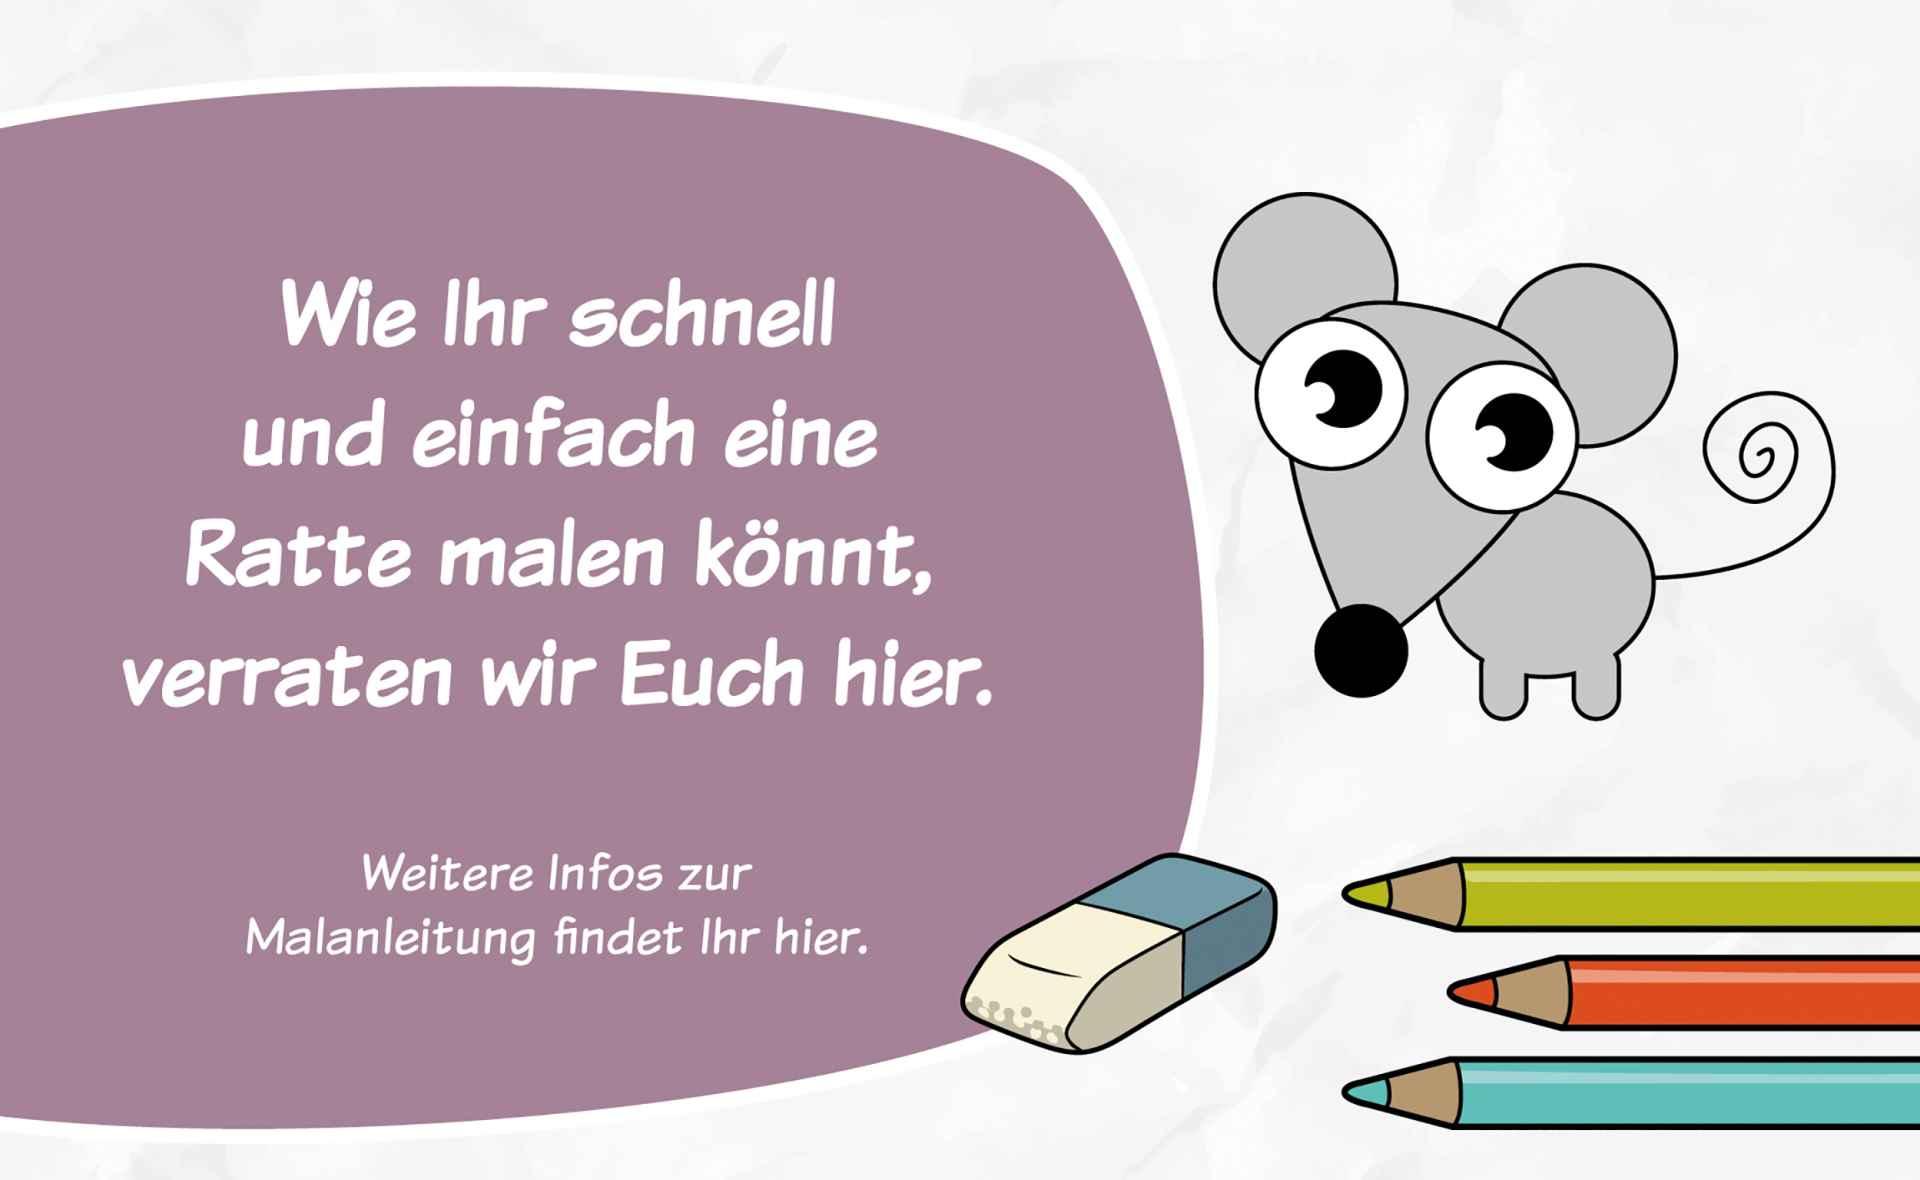 malanleitung_ratte_einklinker